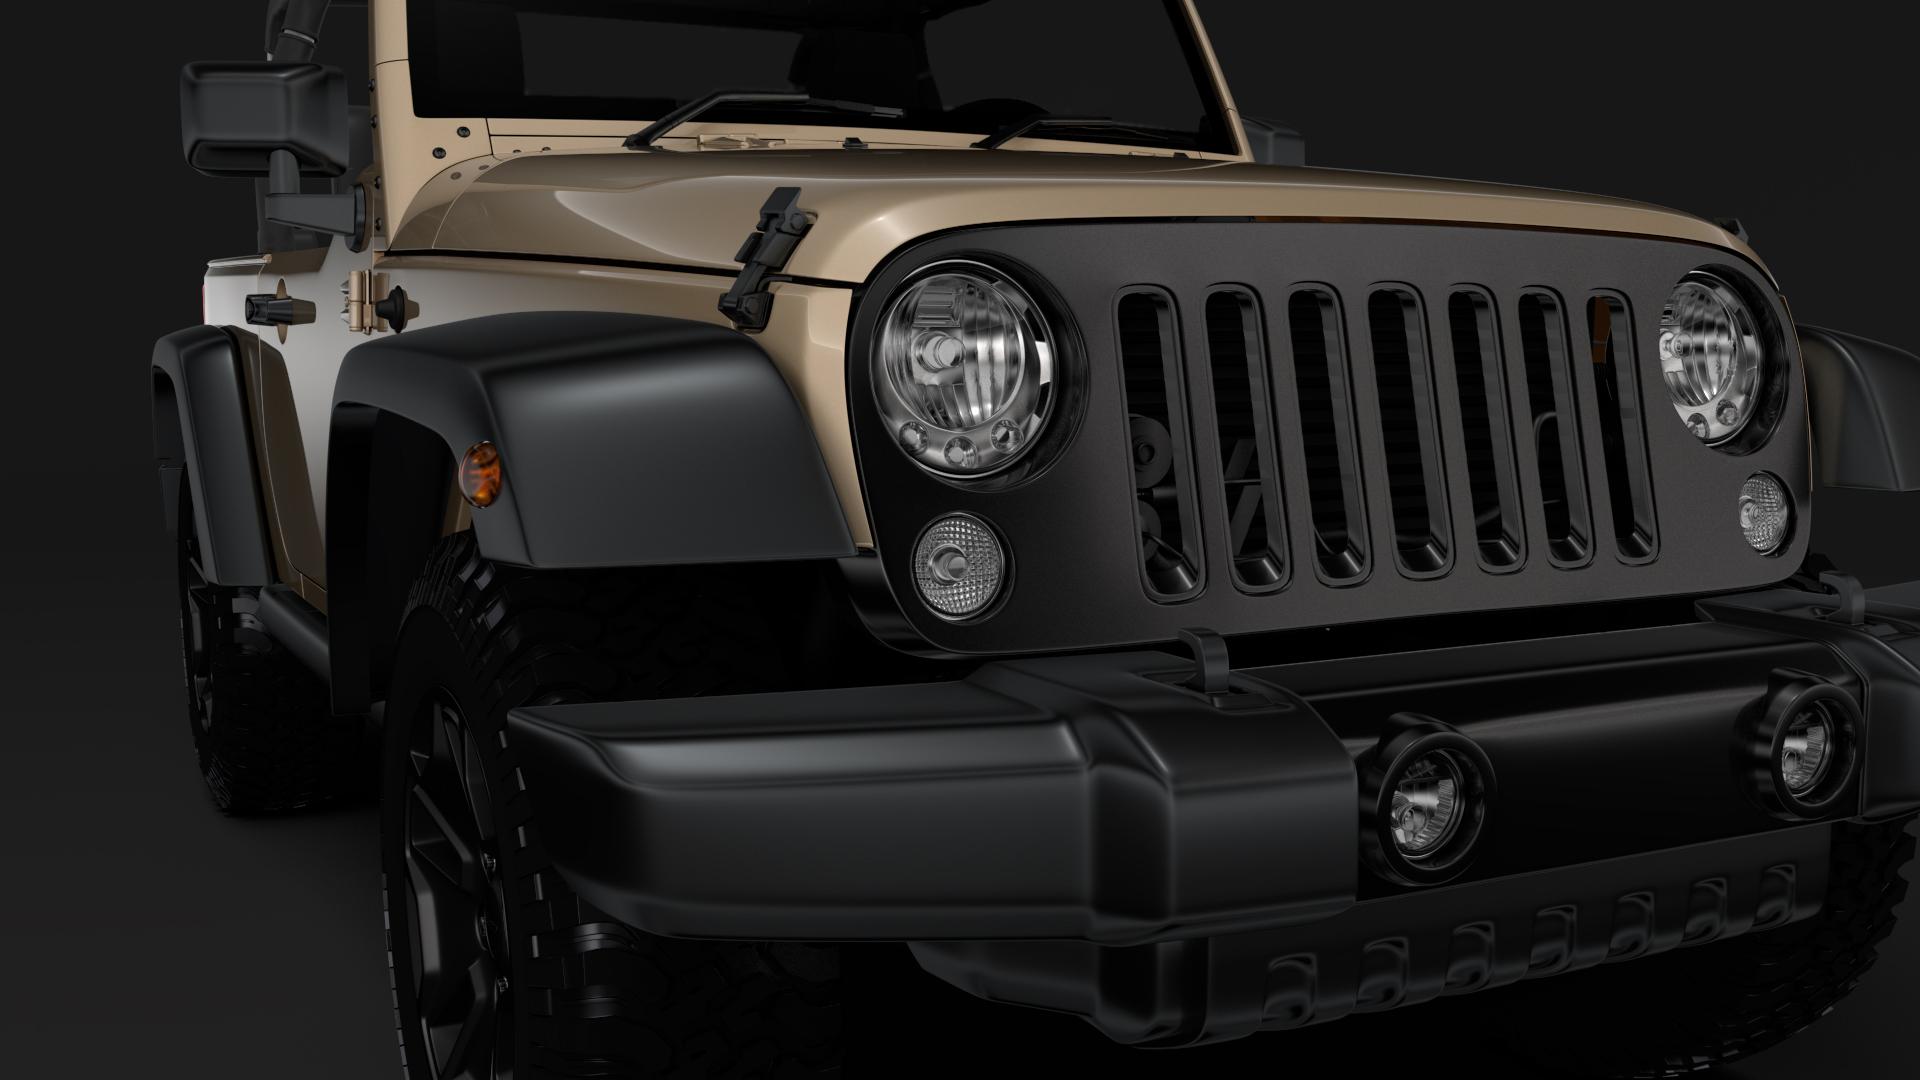 jeep wrangler willys wheeler jk 2017 3d model max fbx c4d lwo ma mb hrc xsi obj 276799